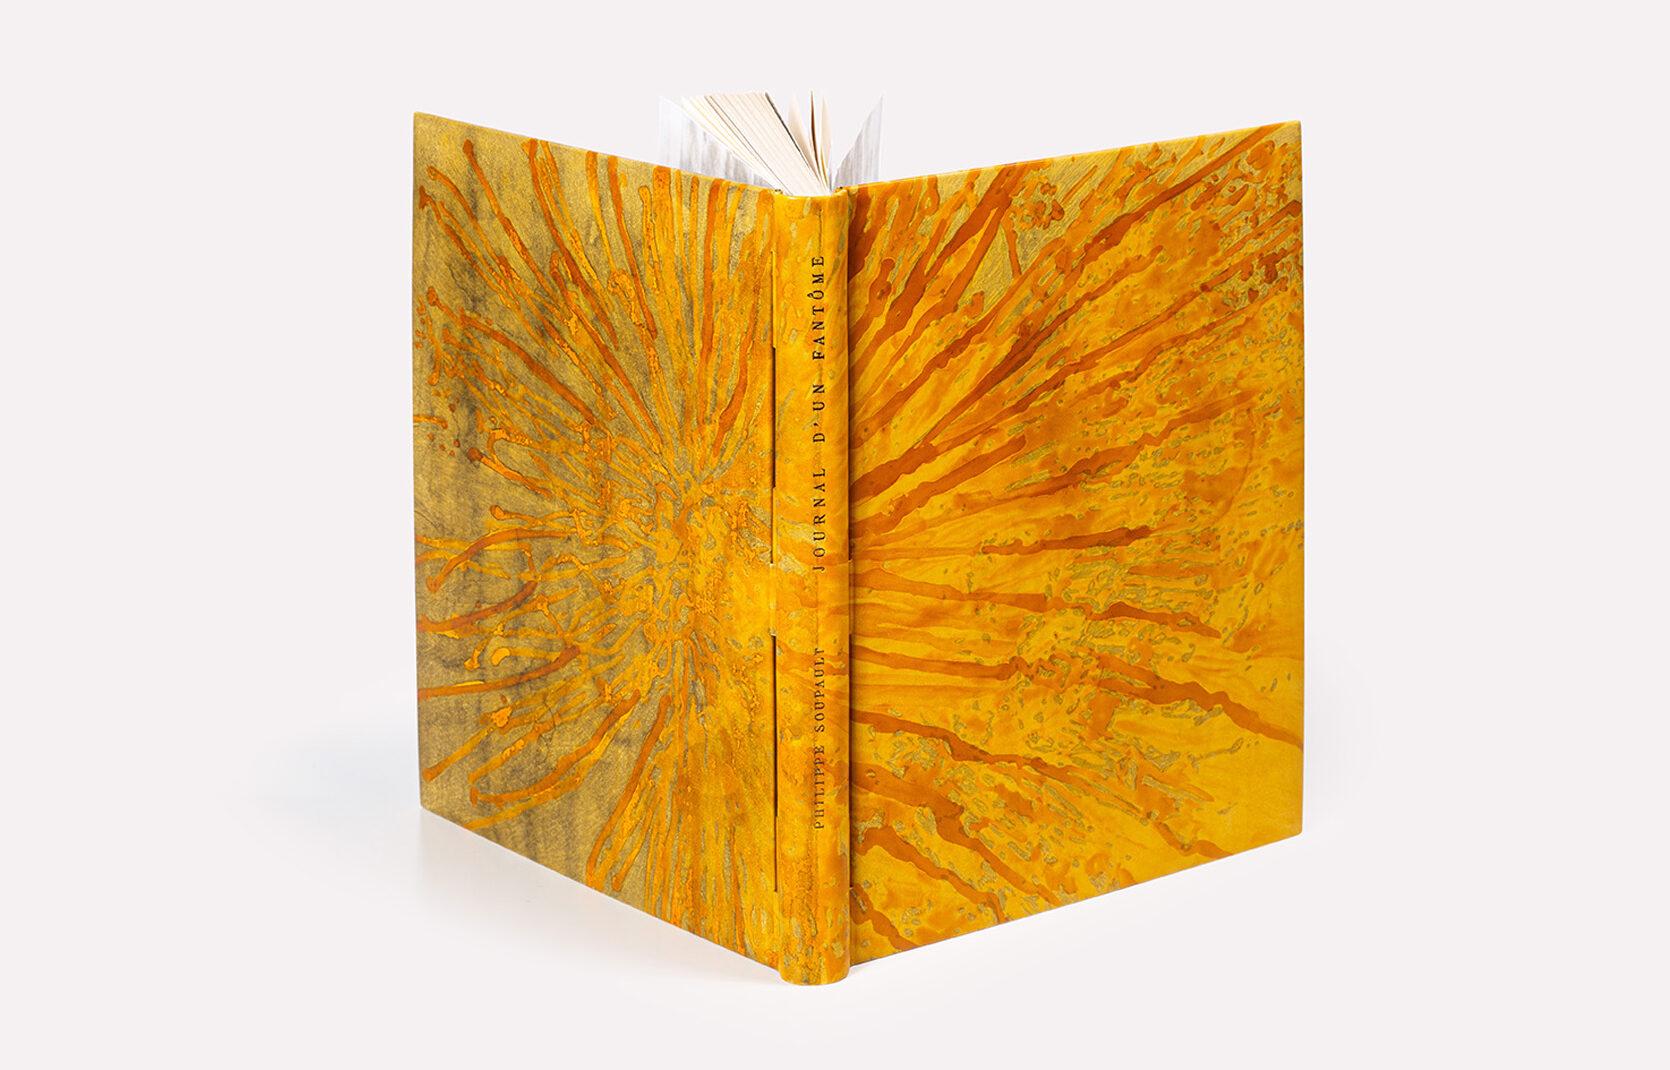 reliure-a-tiges, rod-binding, reliure-tige, reliure-charniere, reliure-piano, bookbinding, reliure, reliure-art, reliure-contemporaine, fine-binding, julie-auzillon, livres-rares